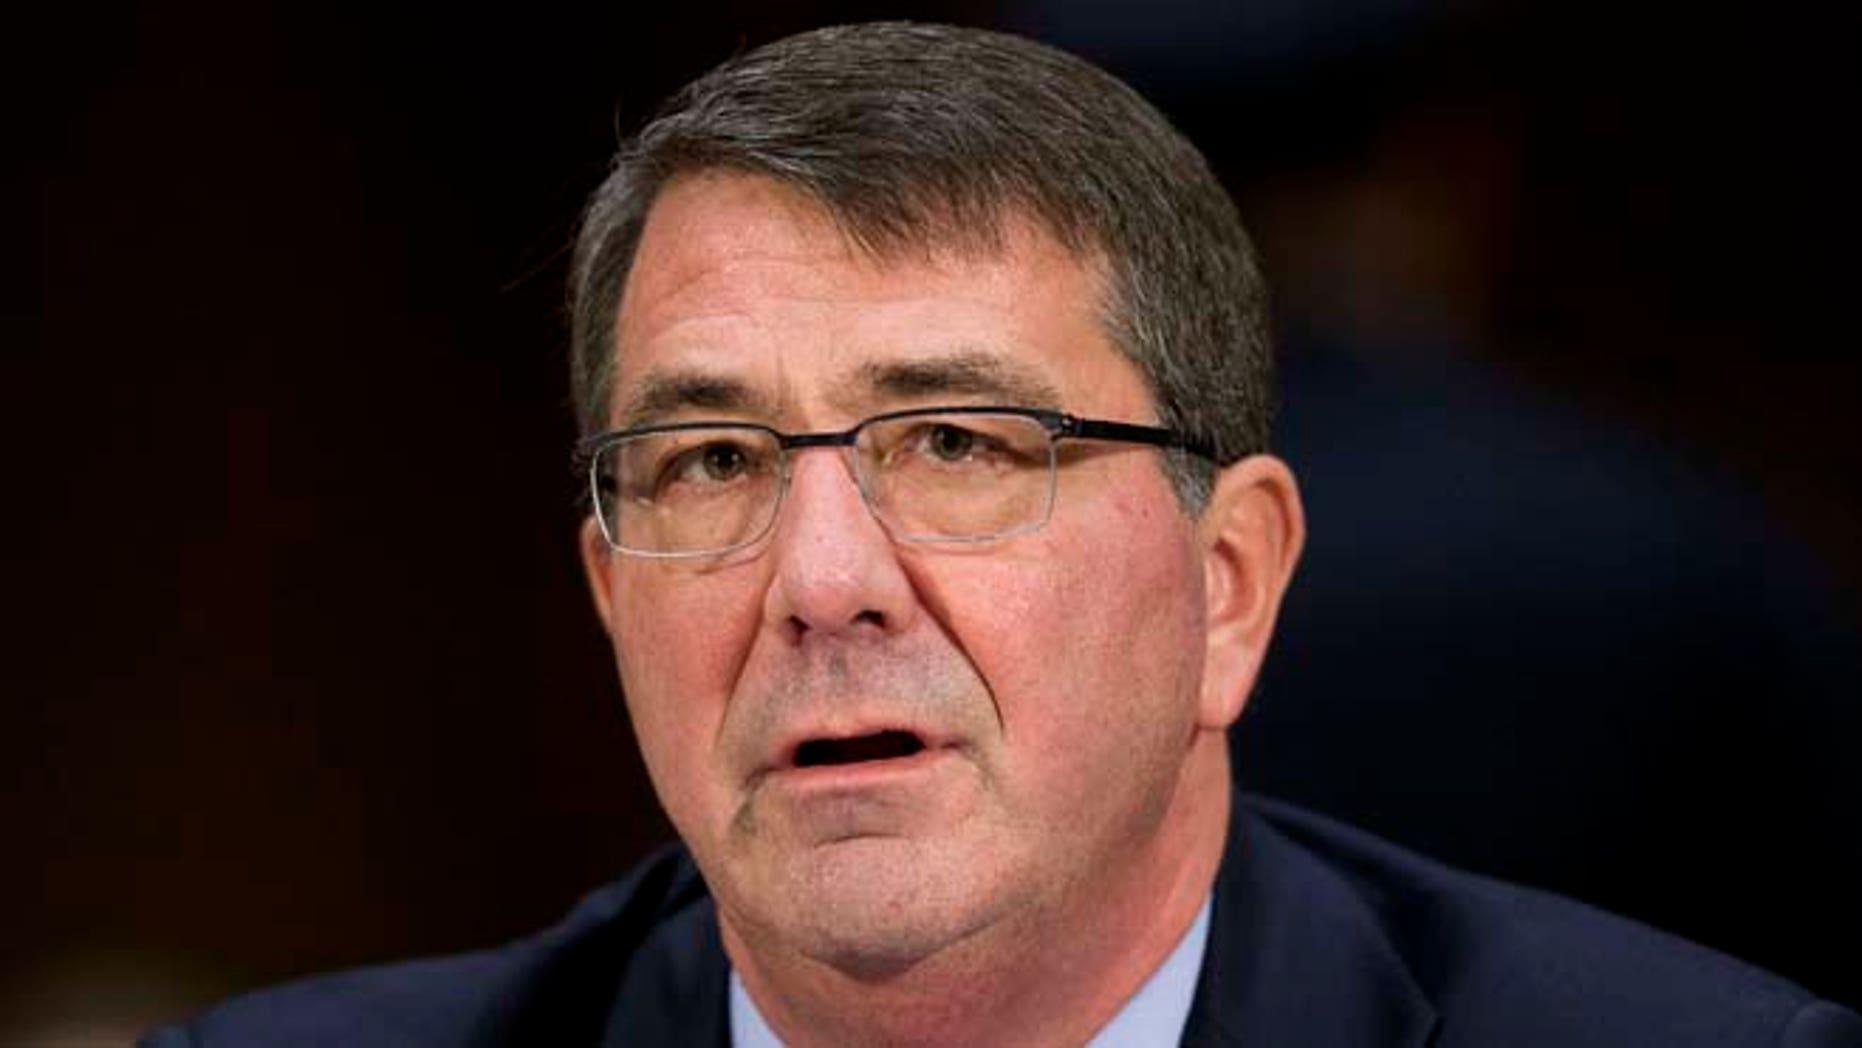 March 11, 2015: Defense Secretary Ash Carter testifies on Capitol Hill in Washington.